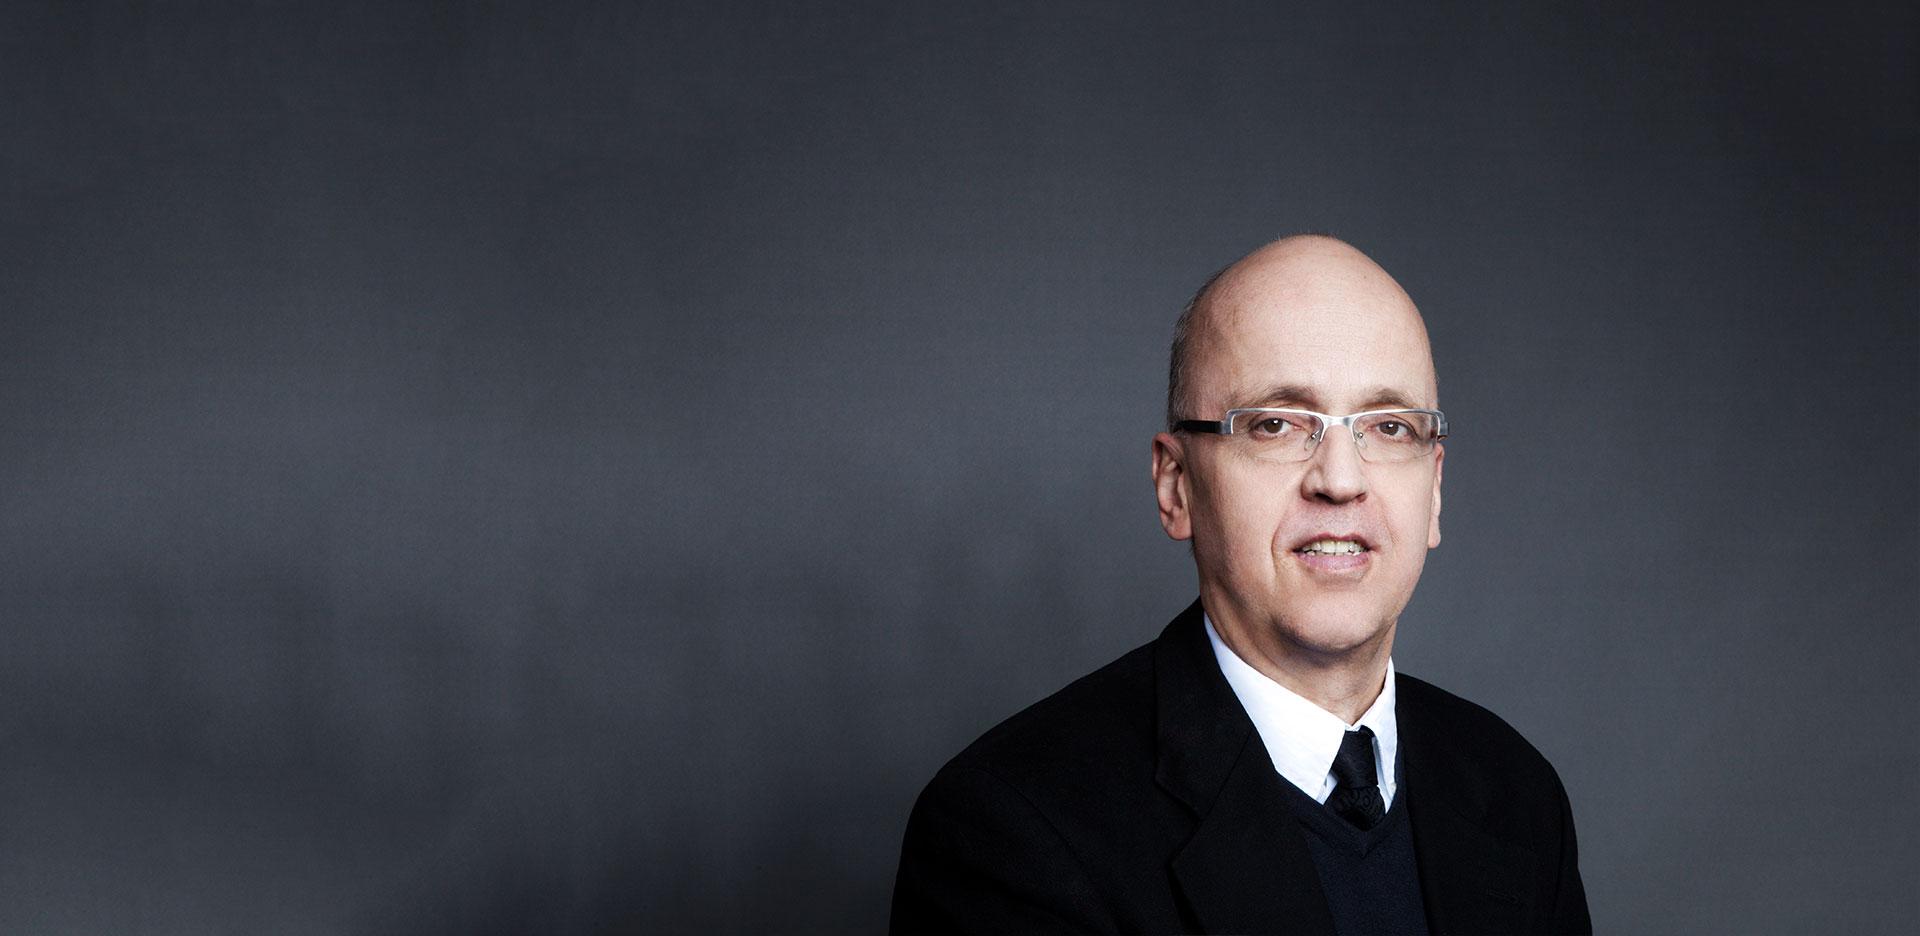 Dr. Tilman Clausen